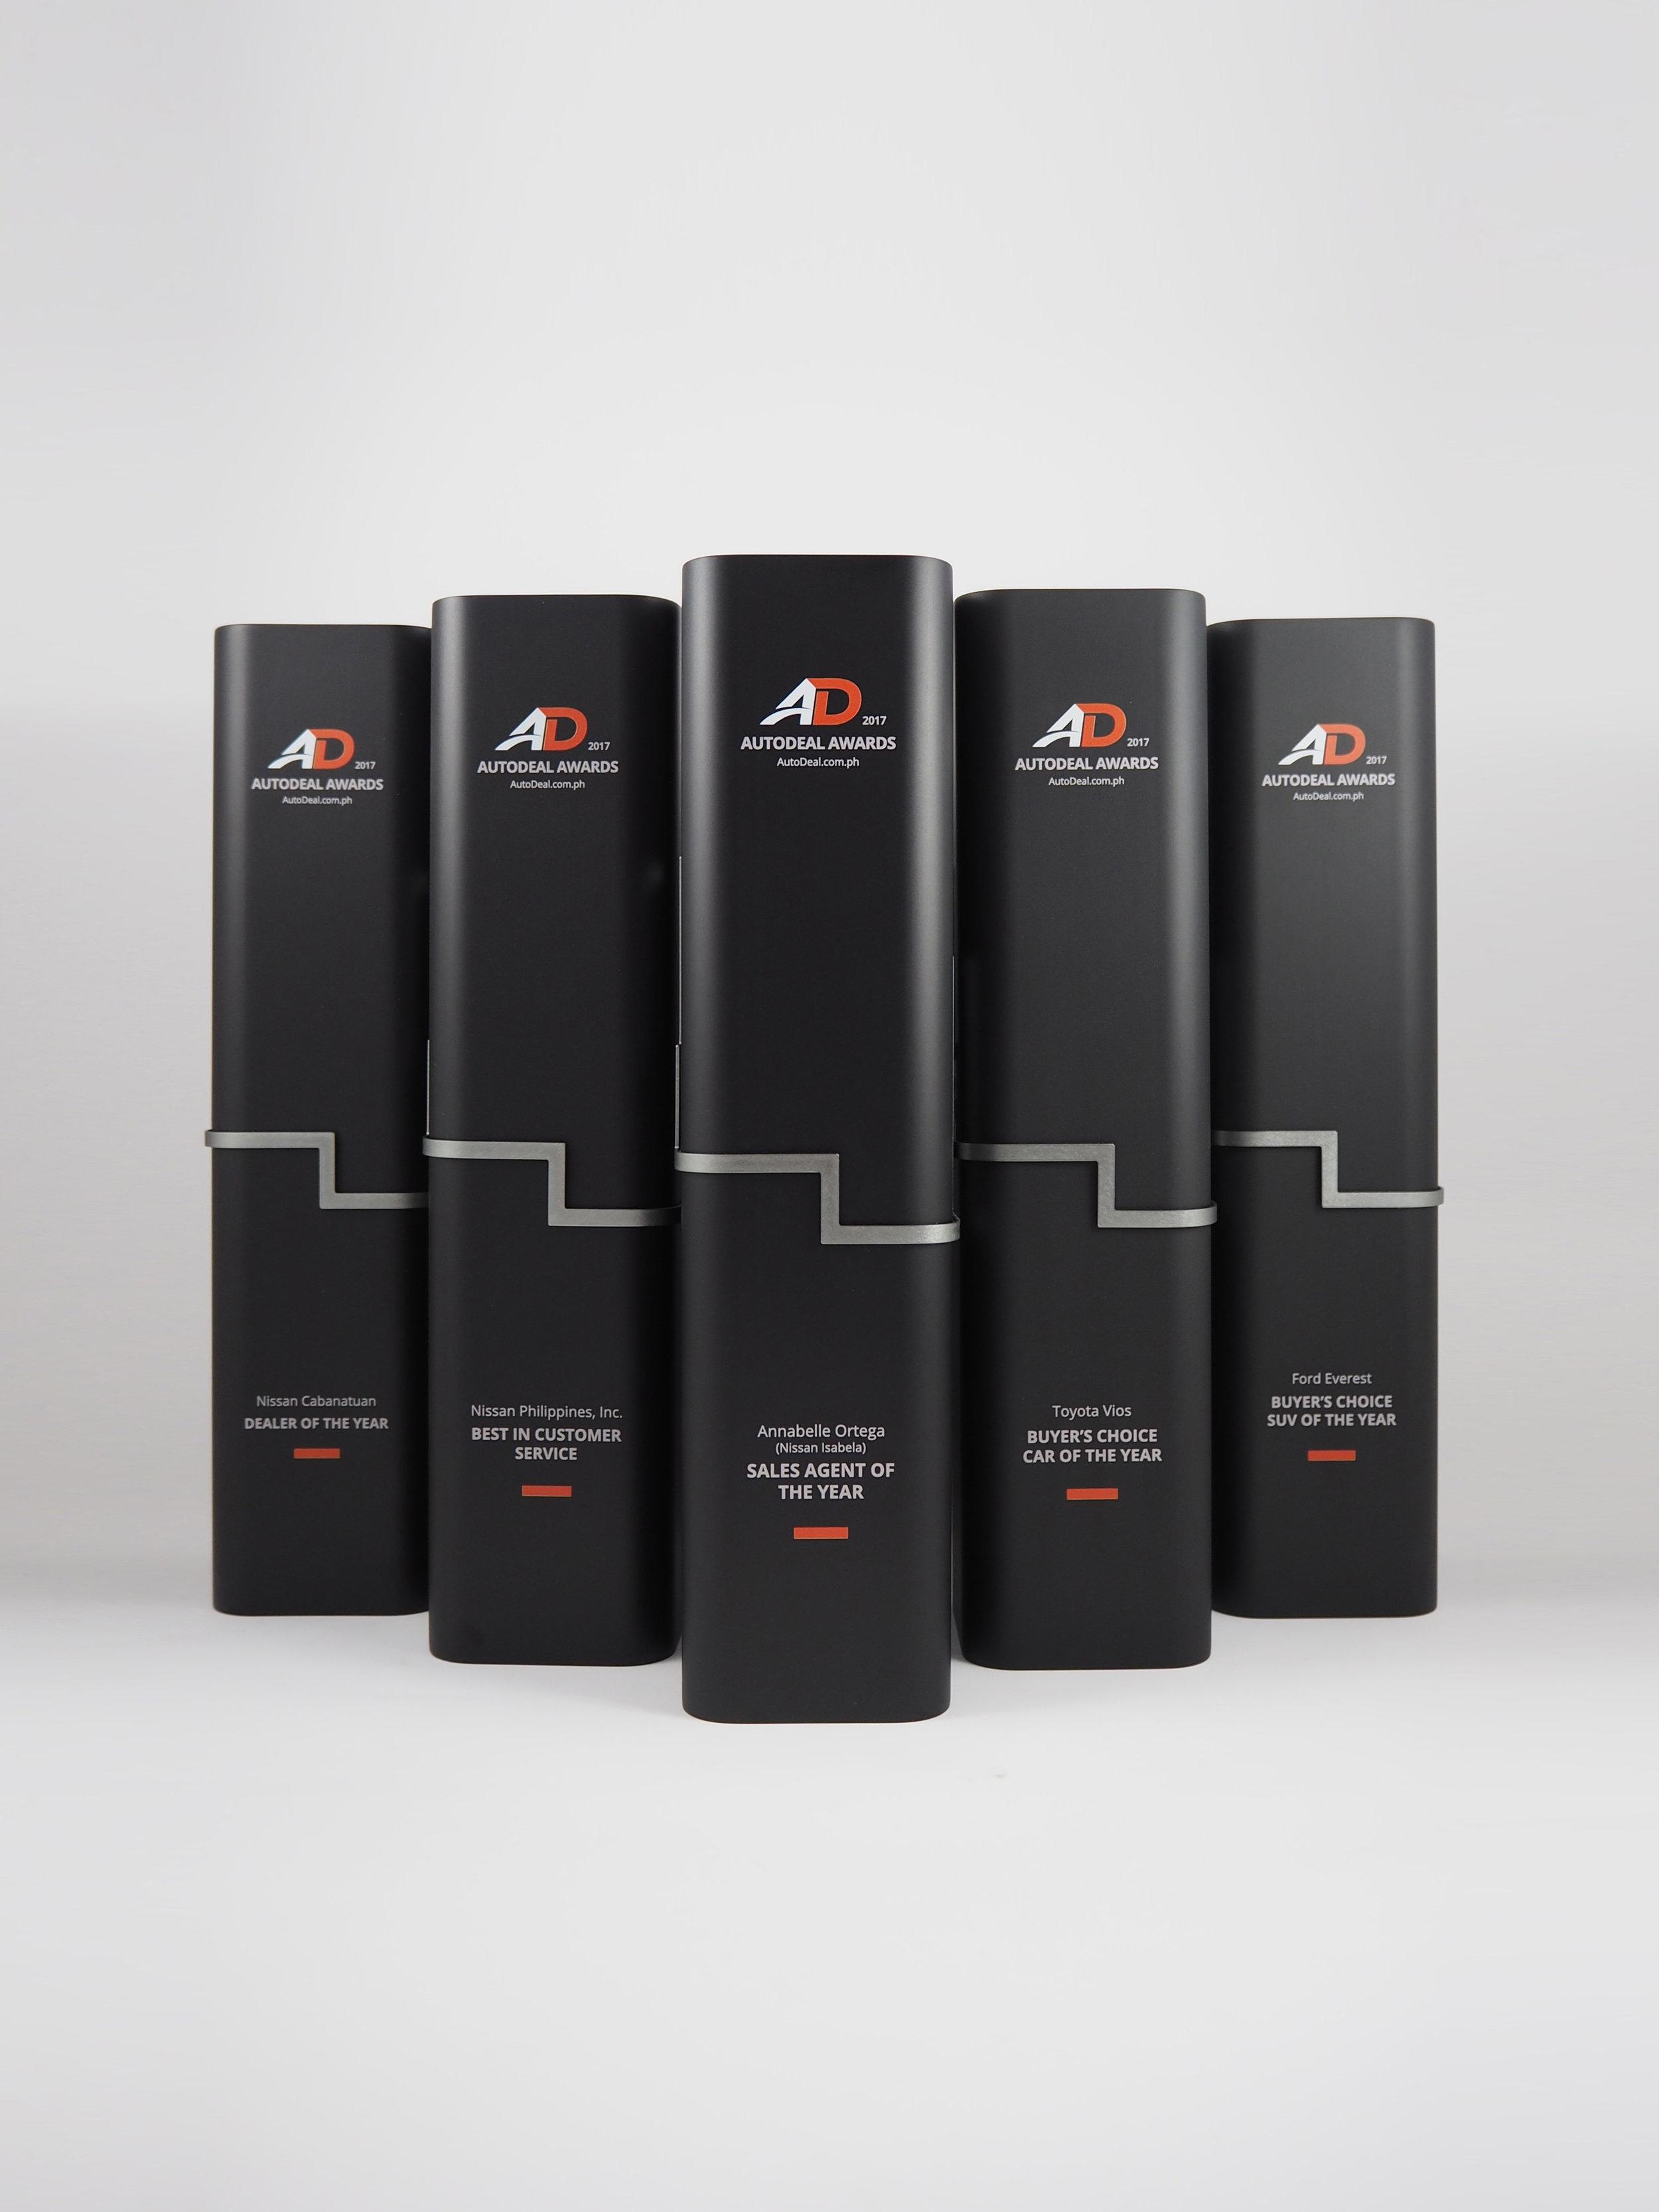 Autodeal-eco-aluminium-trophy-award-01-PB091637.jpg